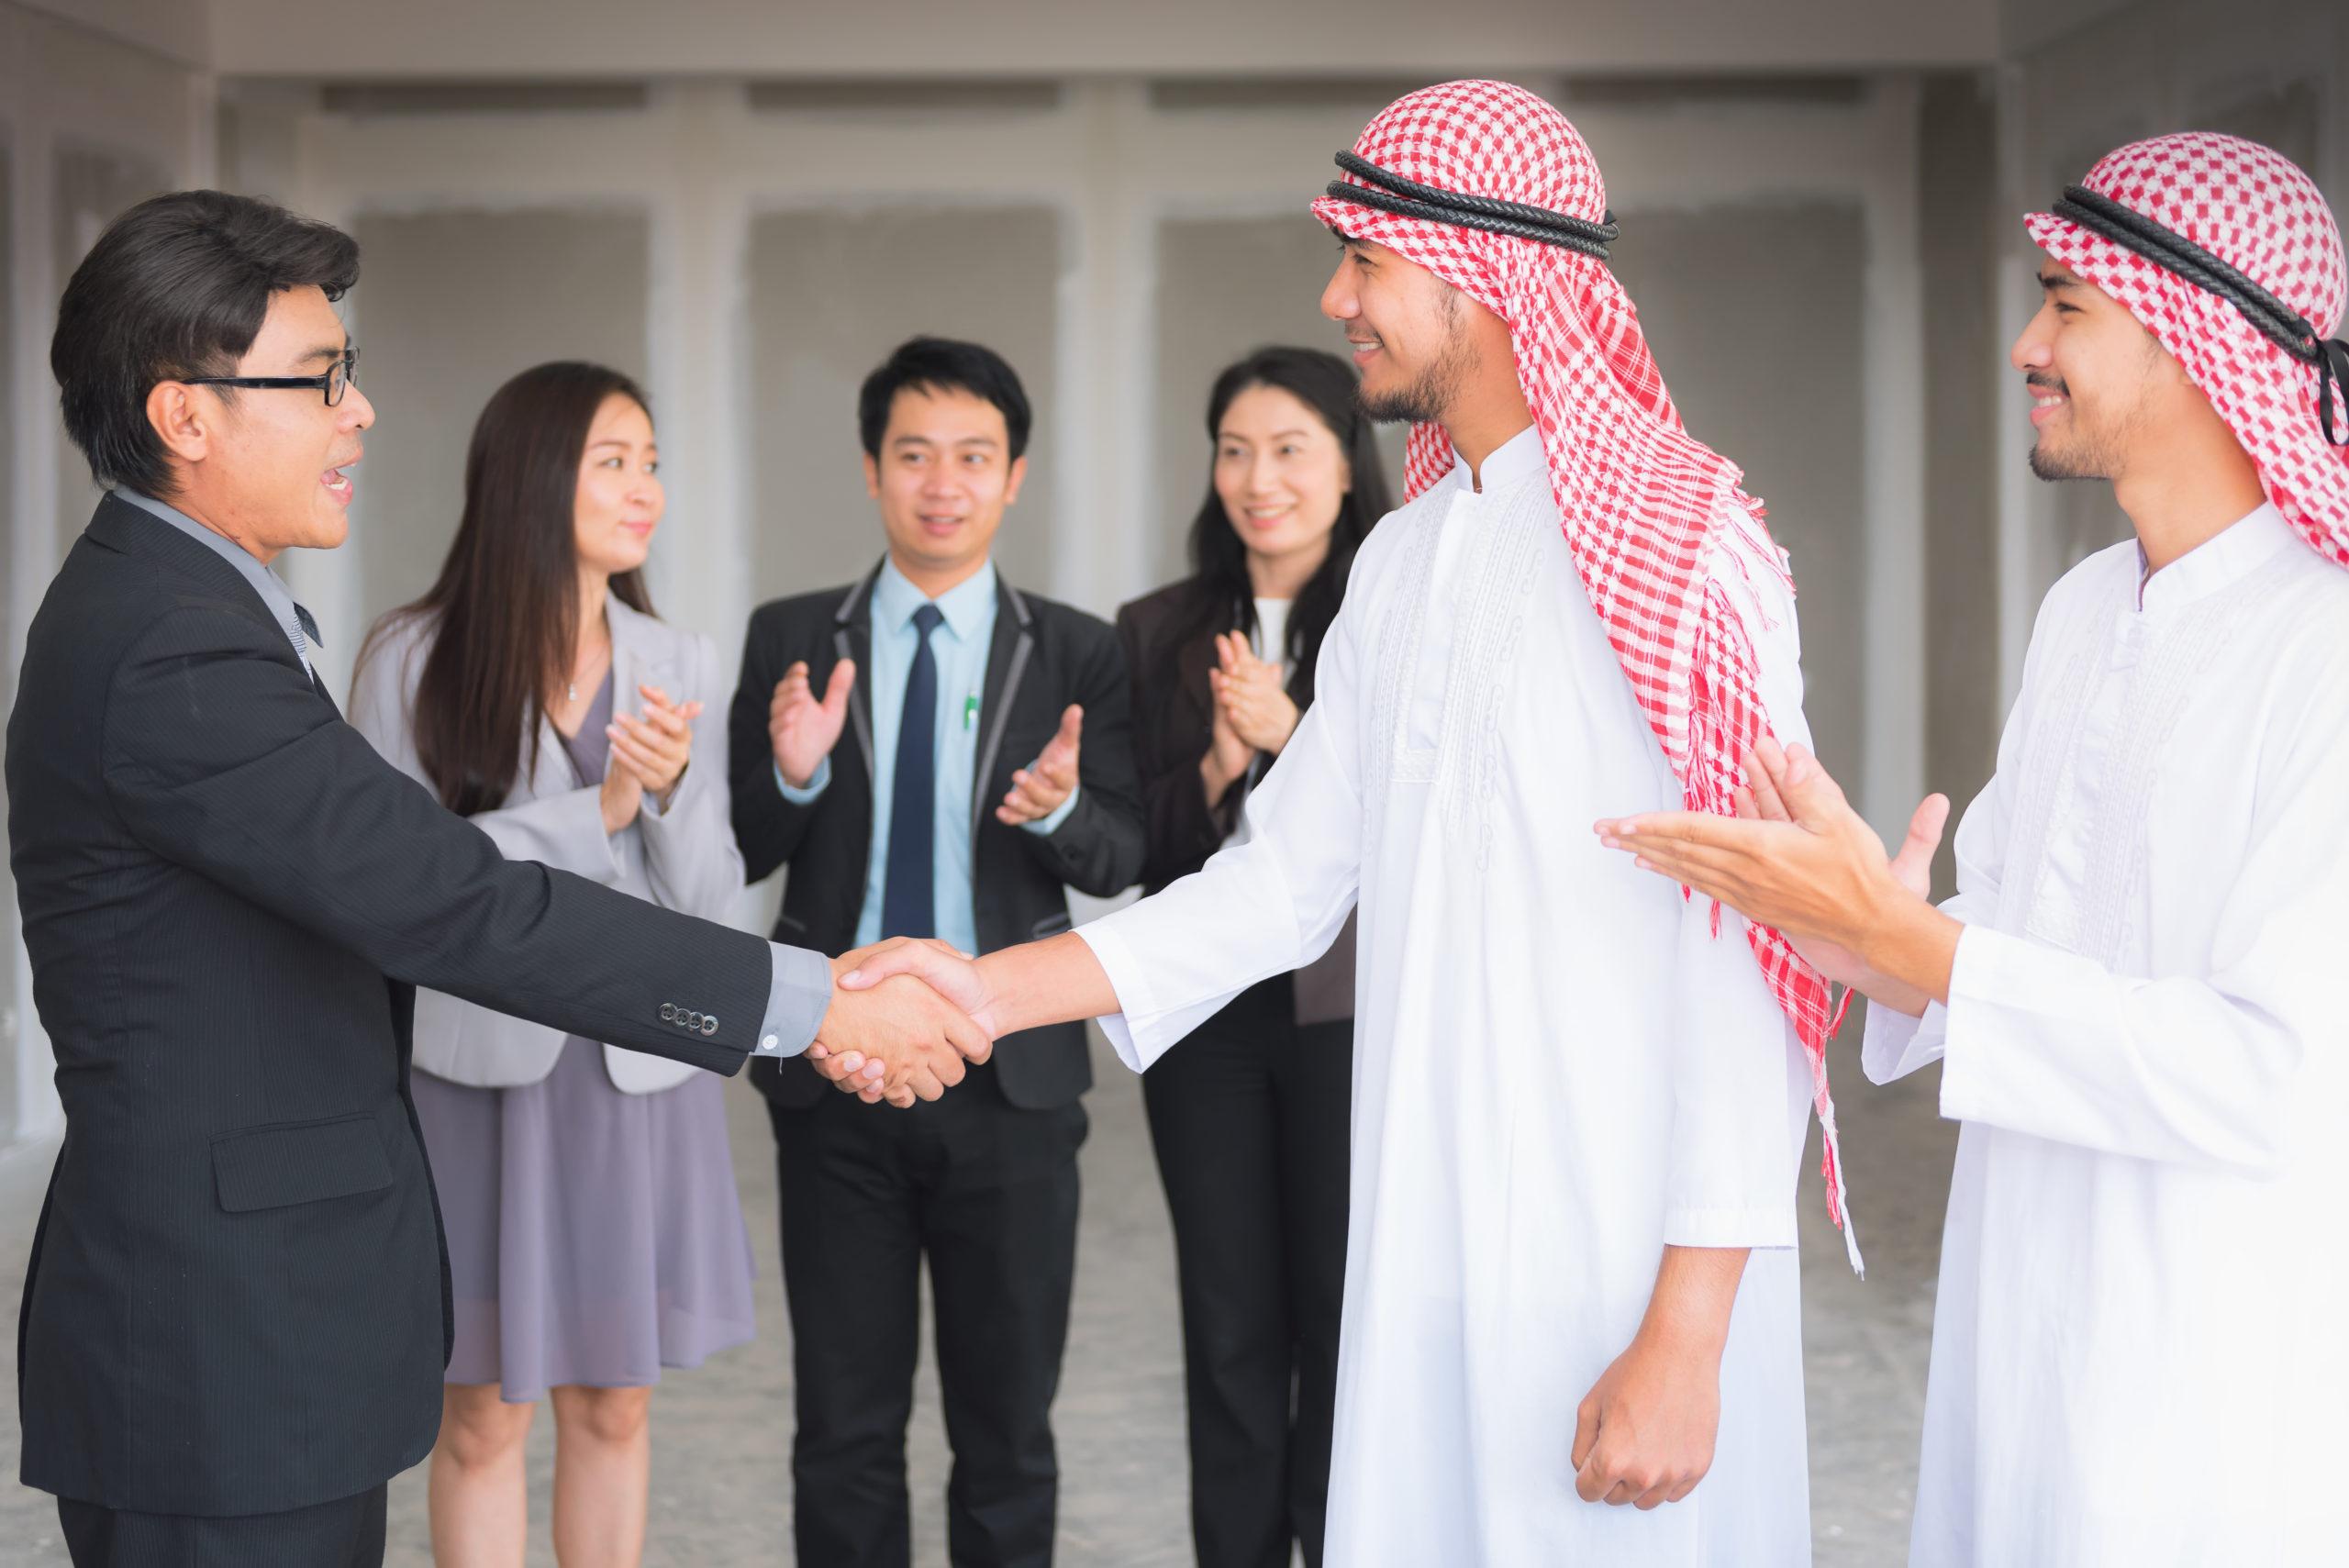 August 8, 25:19 Foreign client information, entertainment, hospitality etiquette